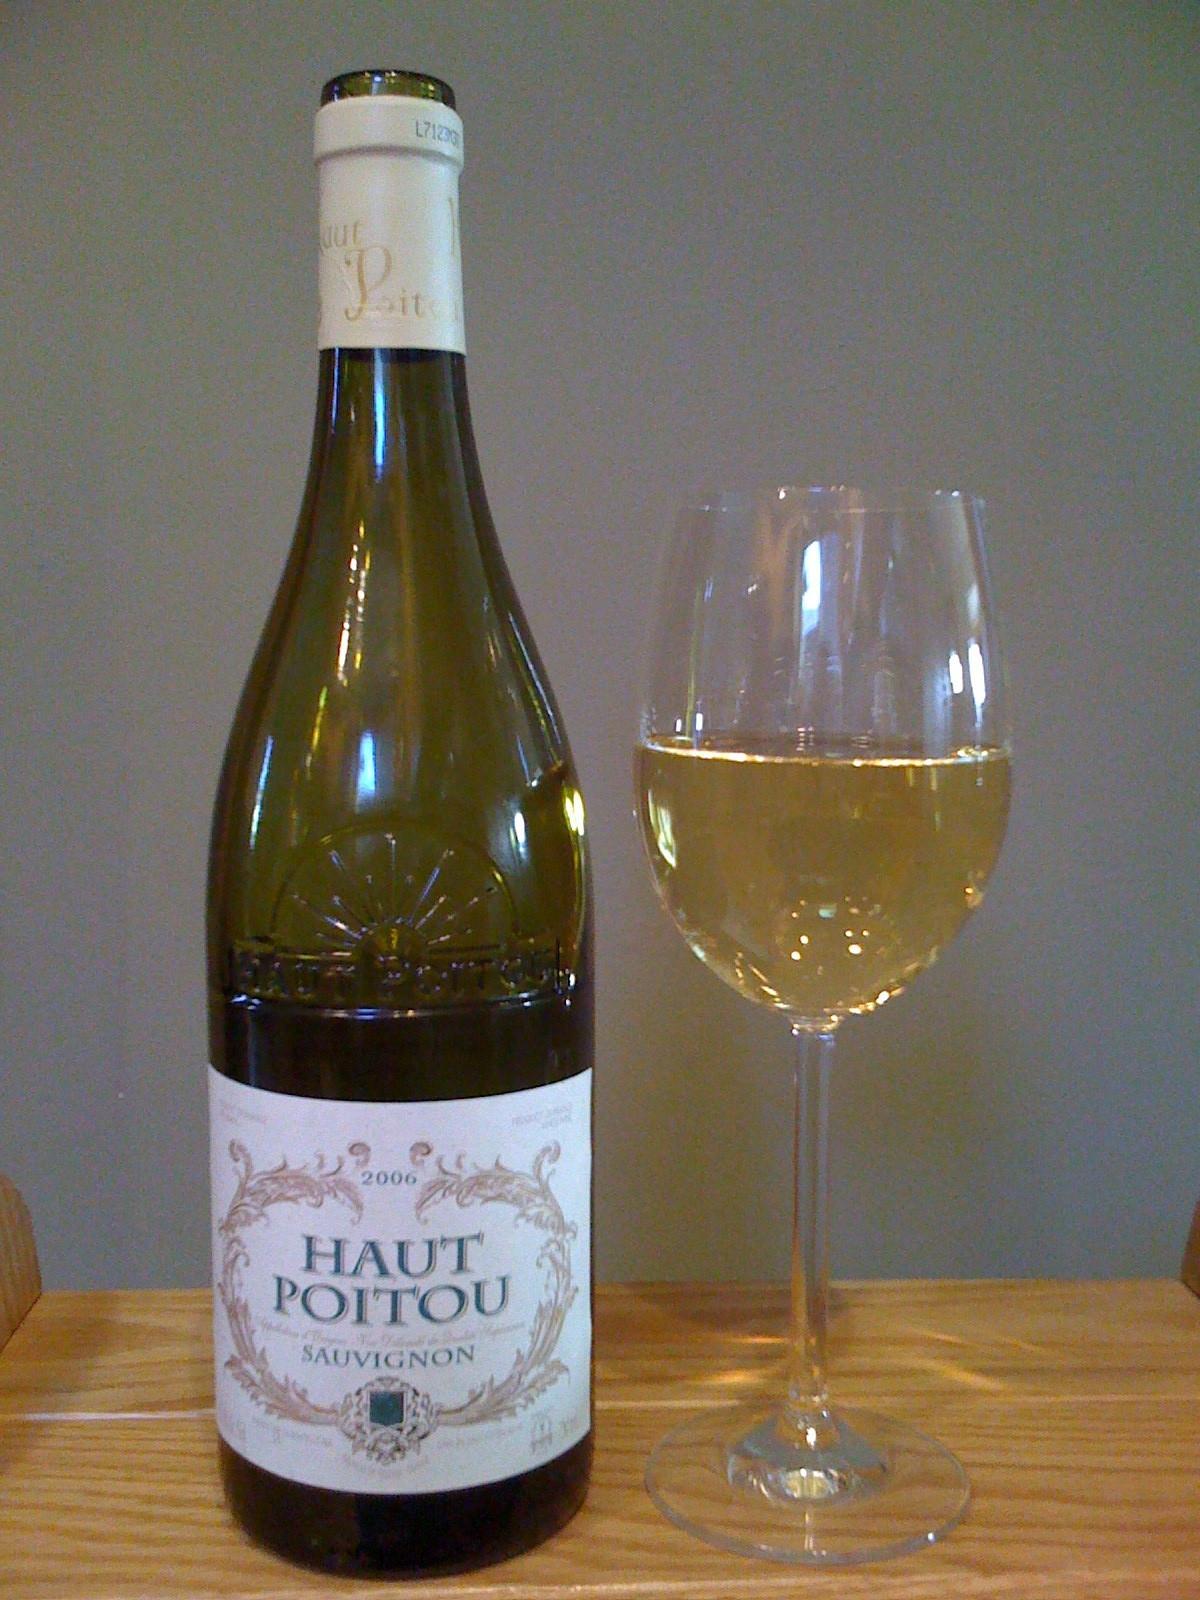 Cave Du Haut-poitou Sauvignon Blanc Haut-poitou Vdqs (2006)